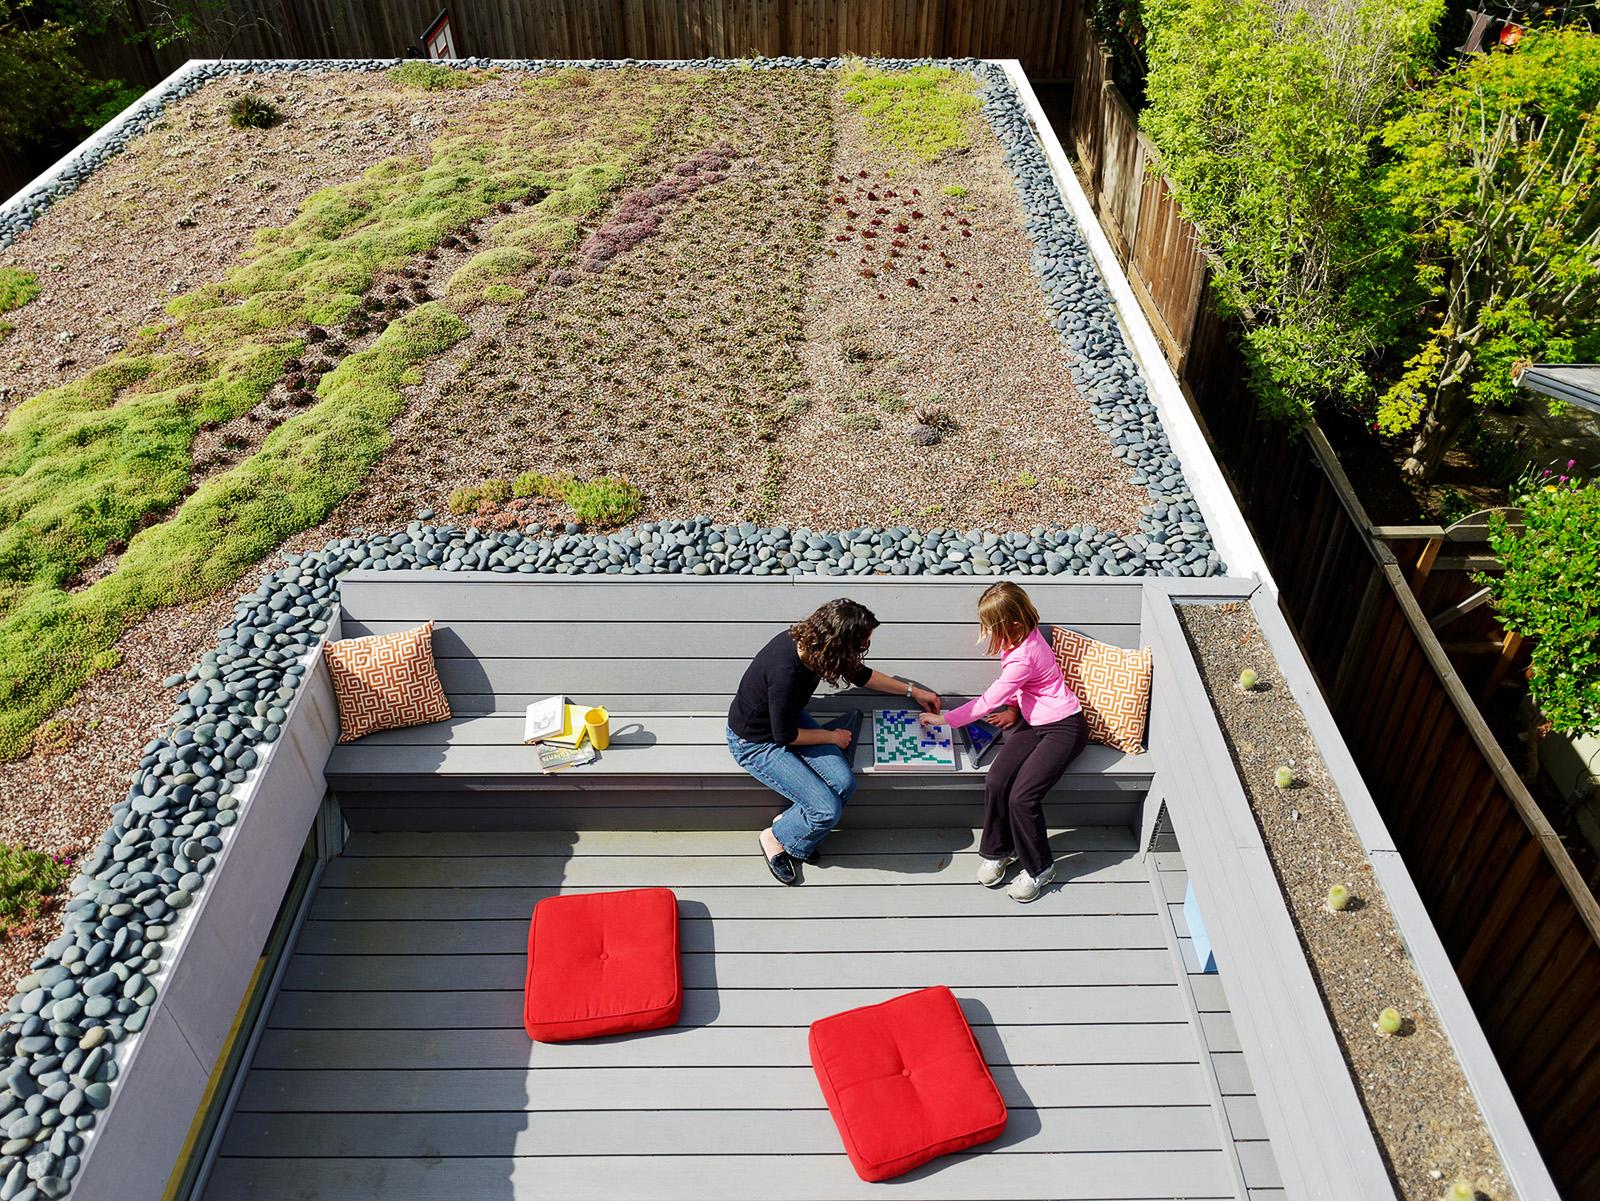 Outdoor roof balcony area with garden